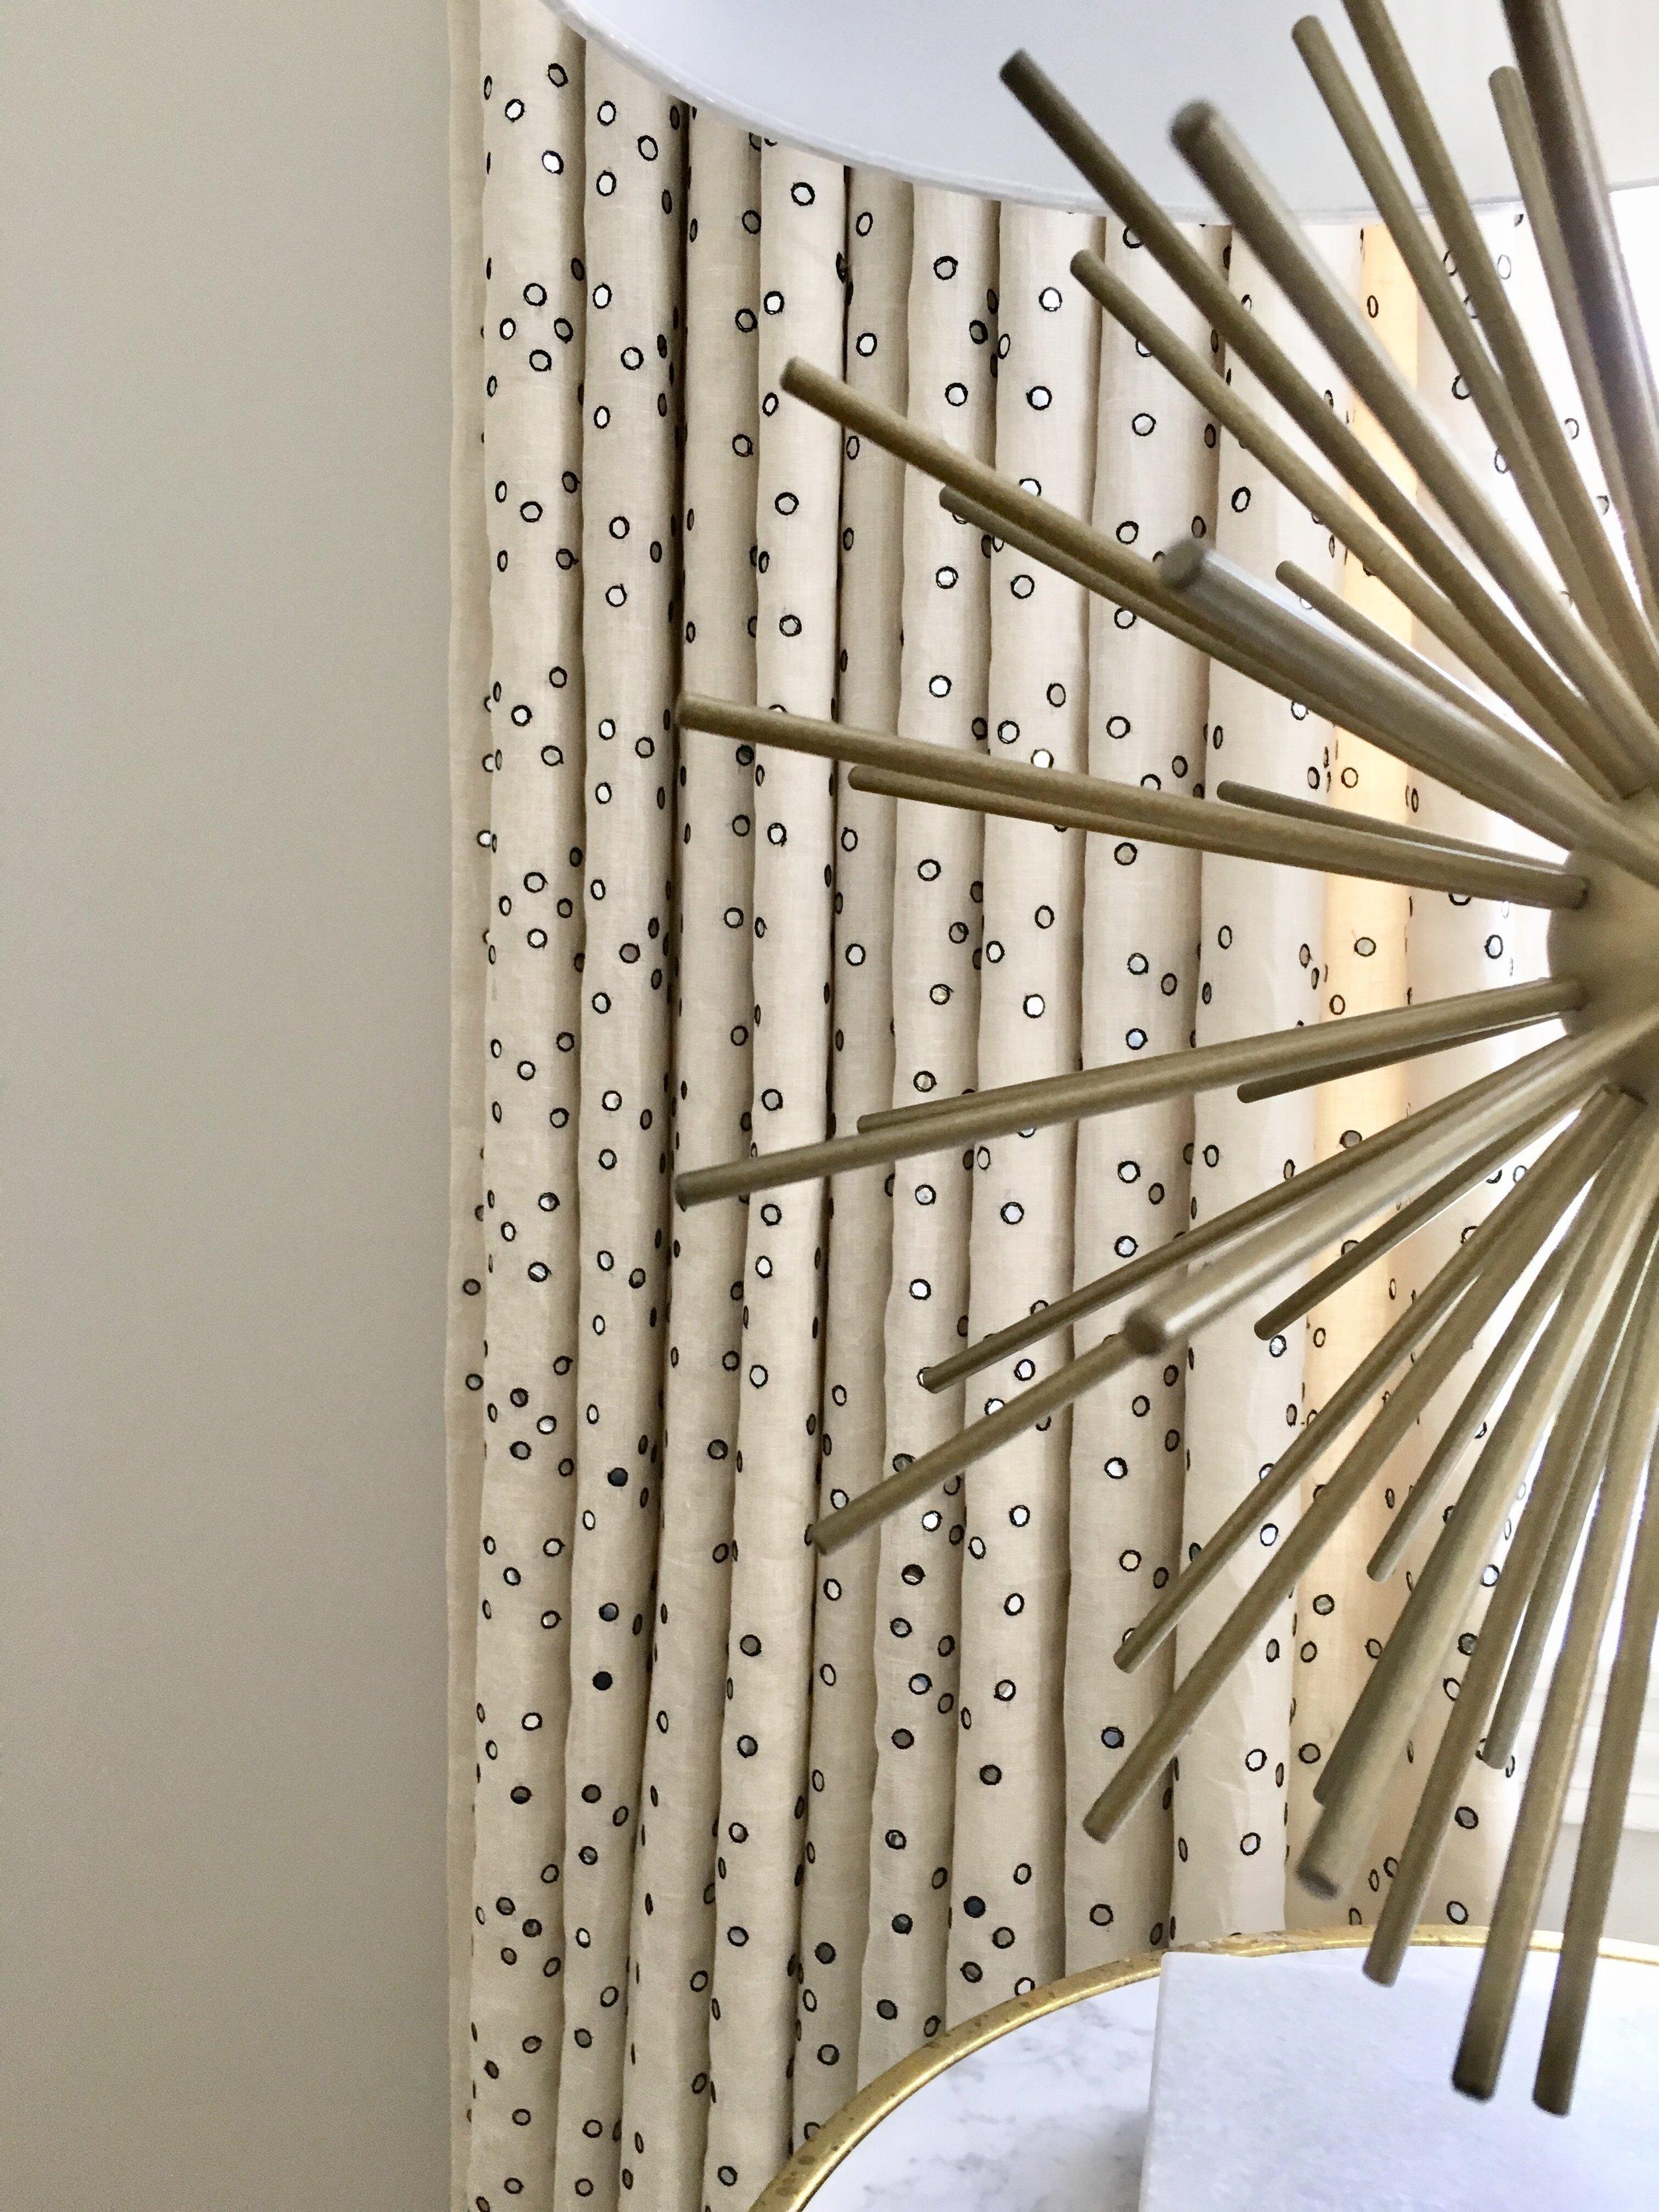 Yep those are tiny mirrors stitched onto fabric panels